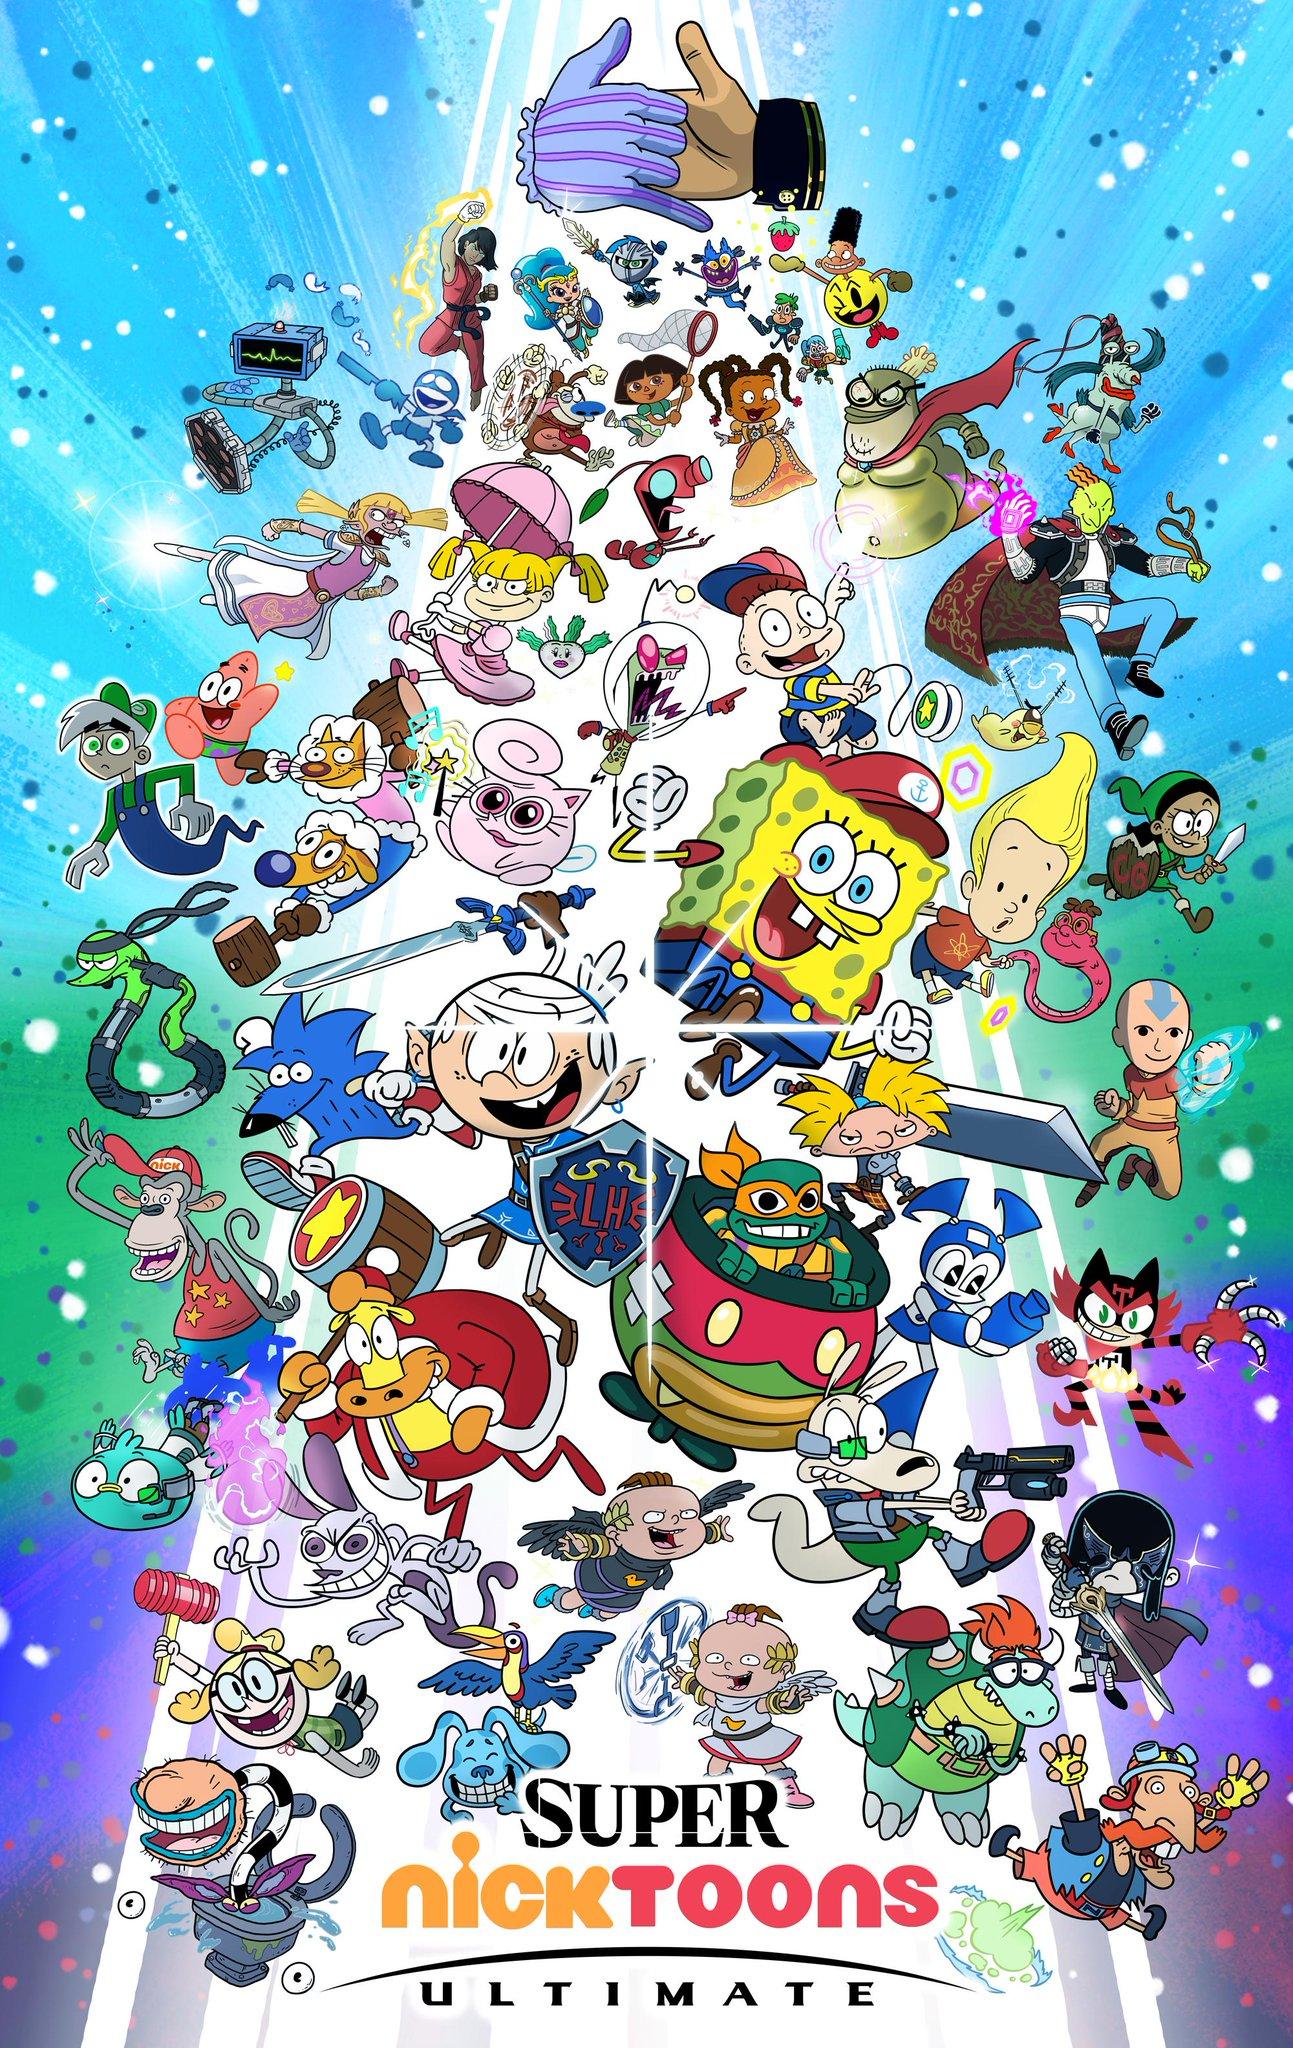 Nicktoons 2019 : nicktoons, Nickelodeon, Animation, Twitter:, ULTIMATE, Nicktoons, Mashup, Poster, @timprendergram, @kurtmsnyder,, Annual, Smash, Bros., Tournament!, 💥#InsideNick…, Https://t.co/Mwp5kYOyhK